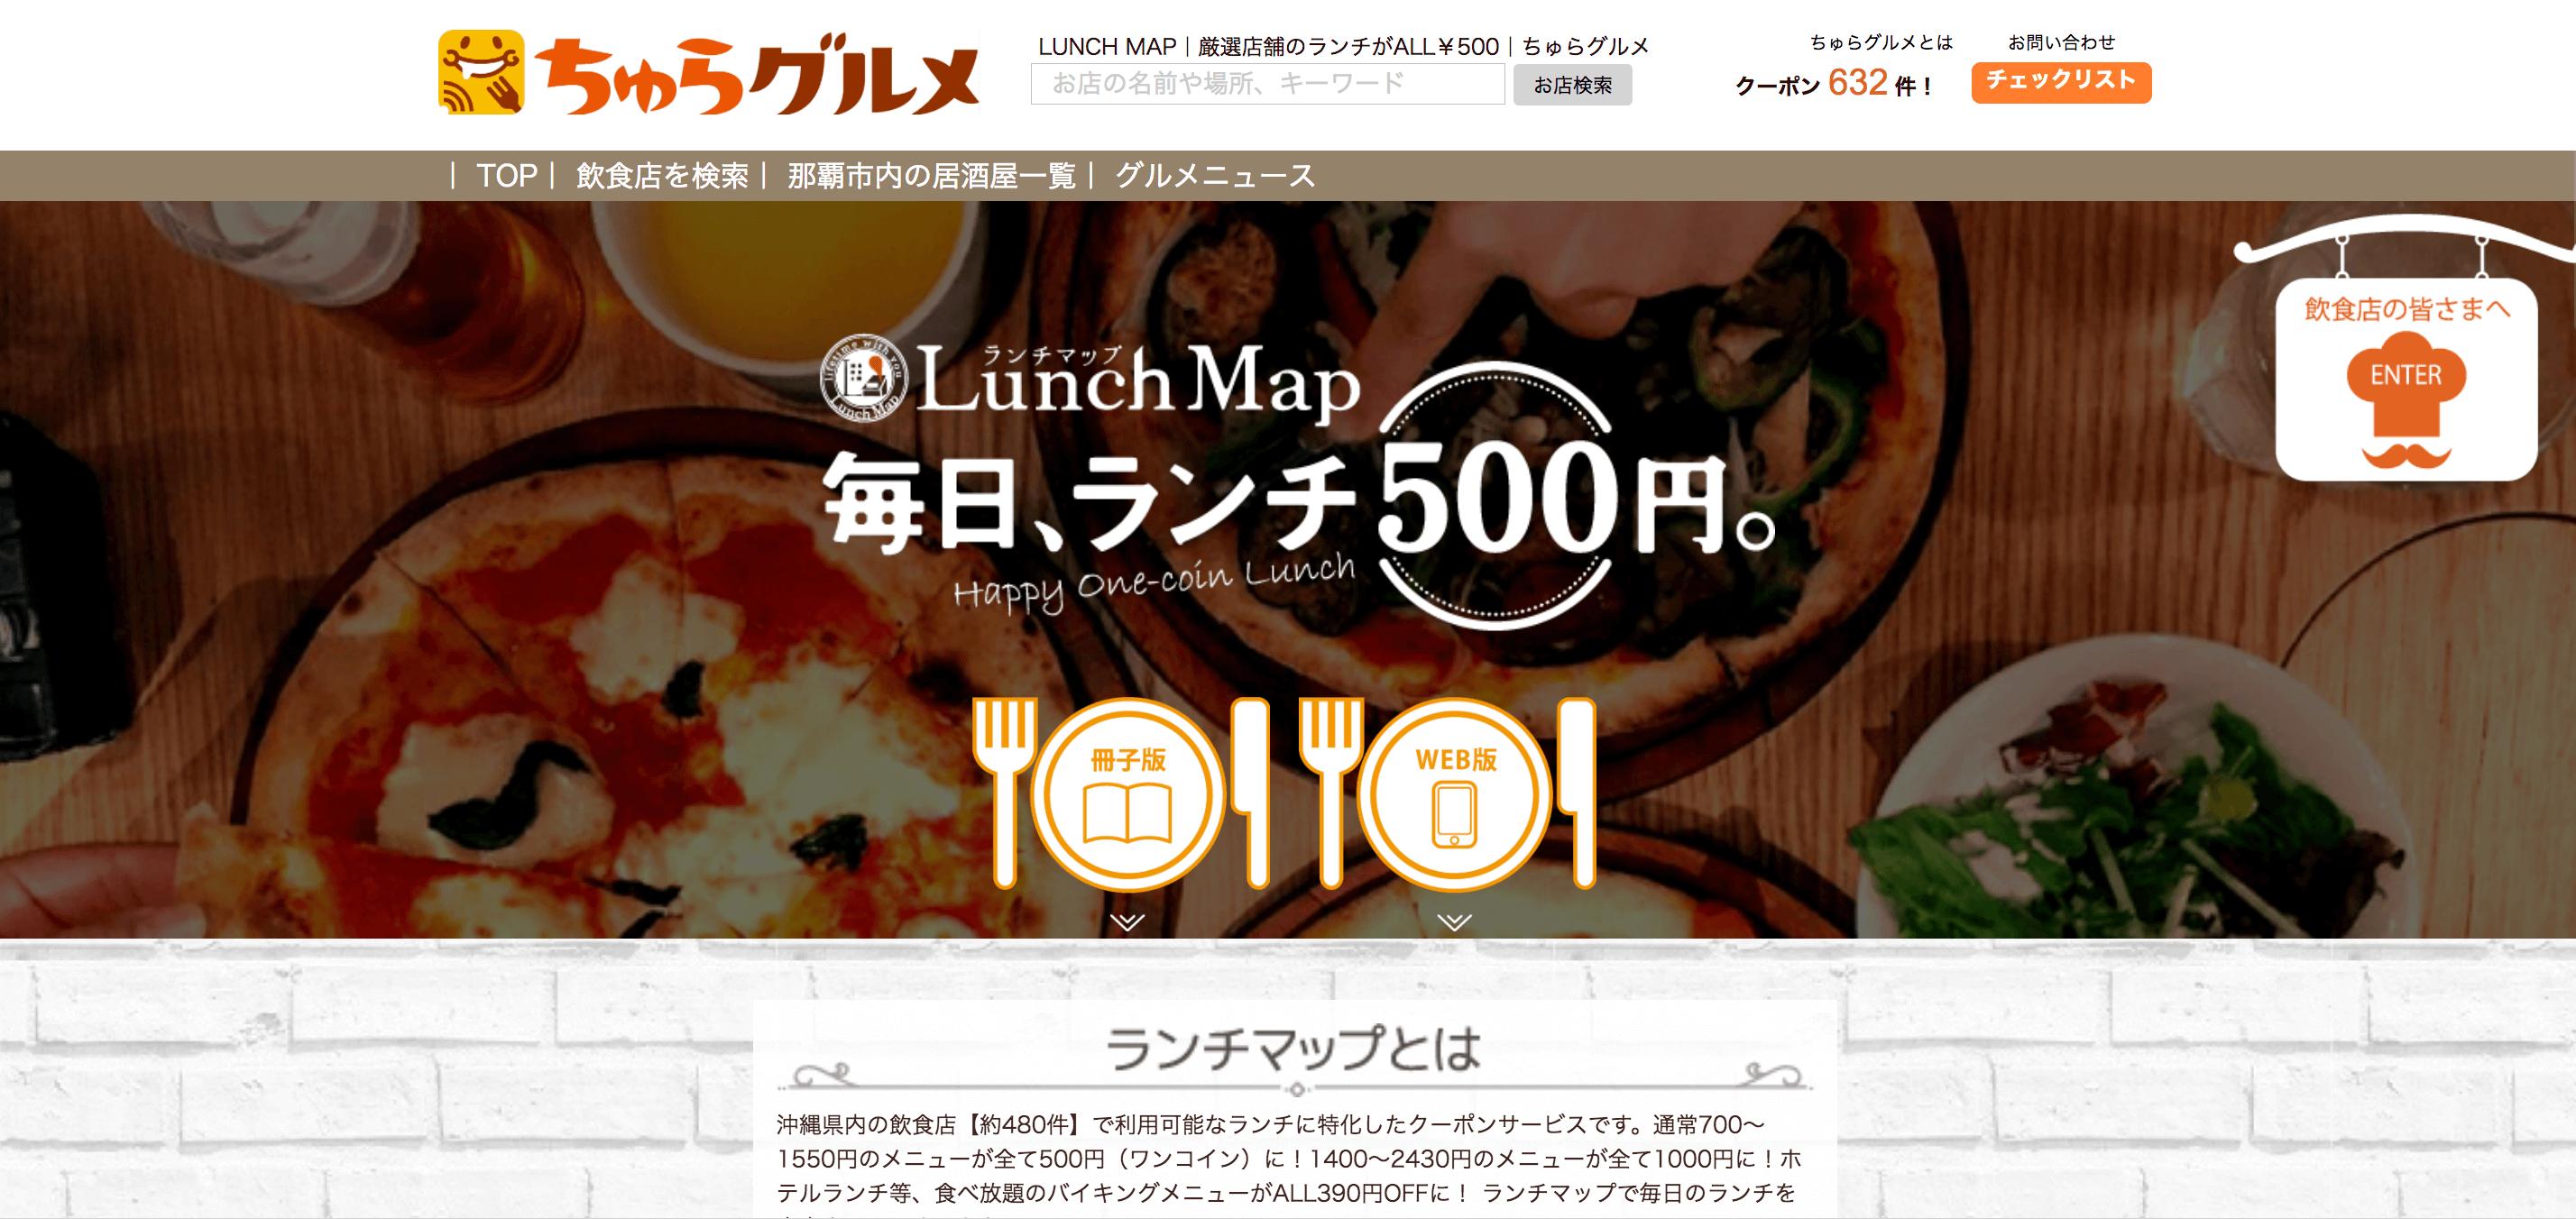 lunchmap_004